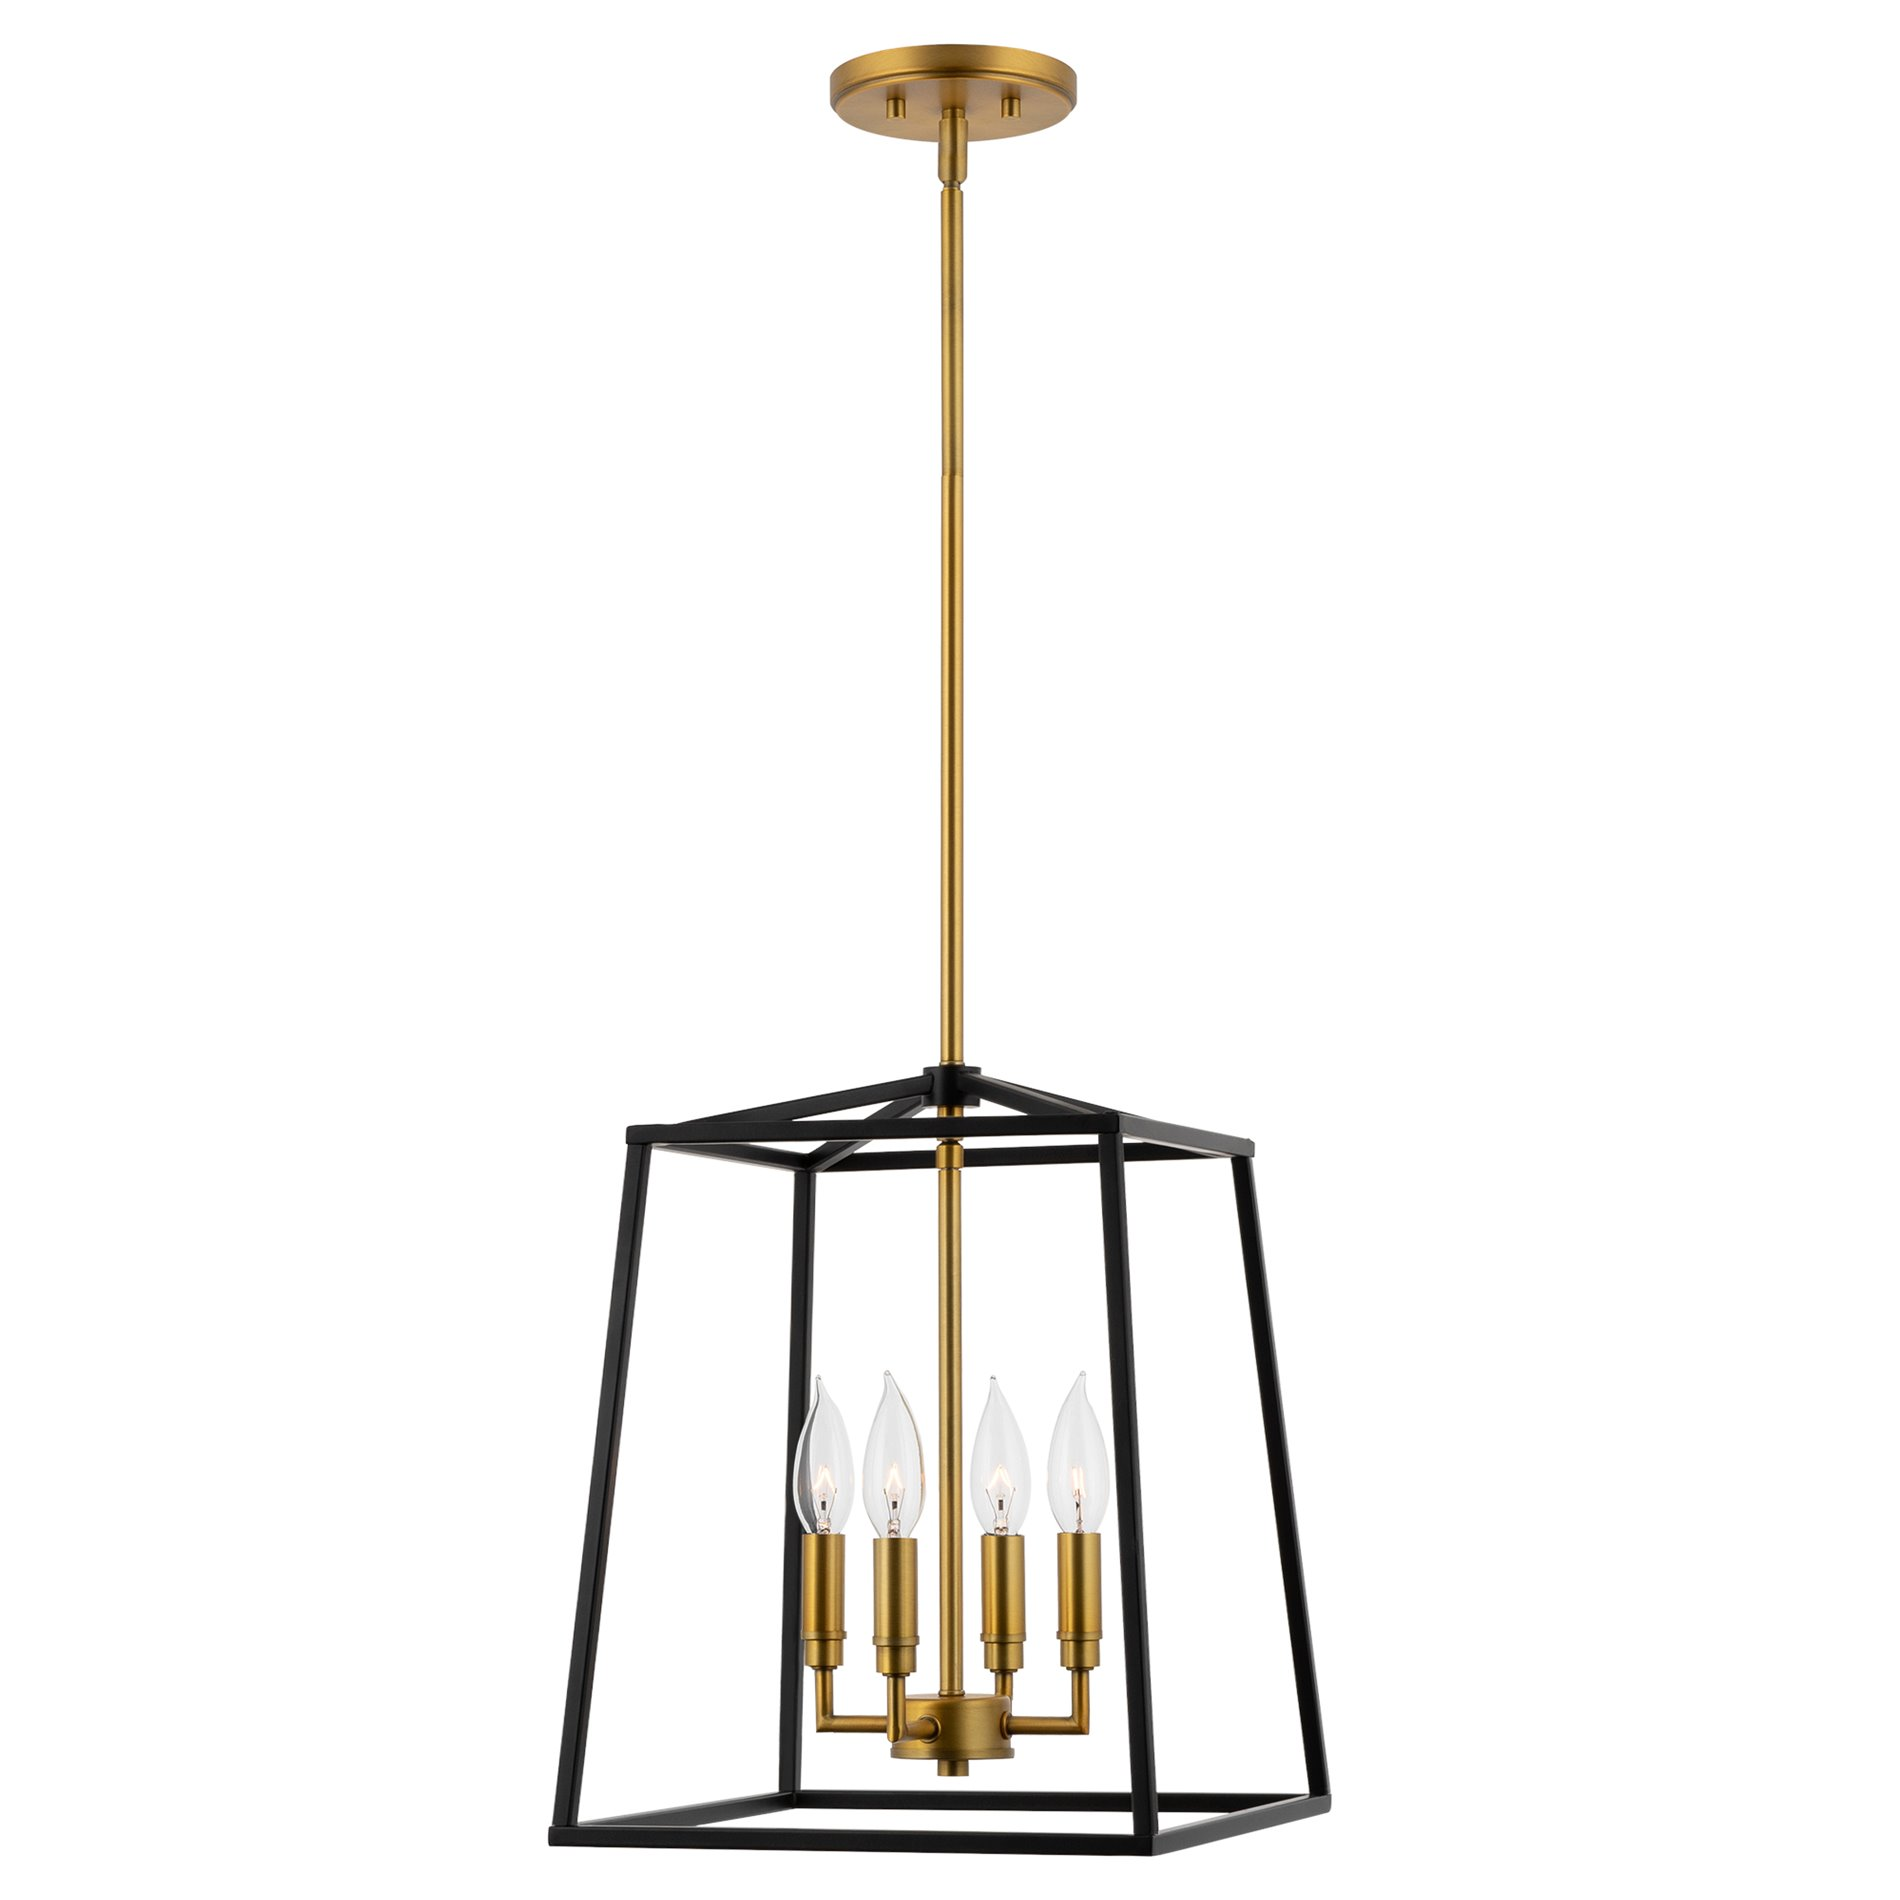 kira home bellevue 15 5 4 light farmhouse lantern pendant light adjustable foyer chandelier warm brass accents black